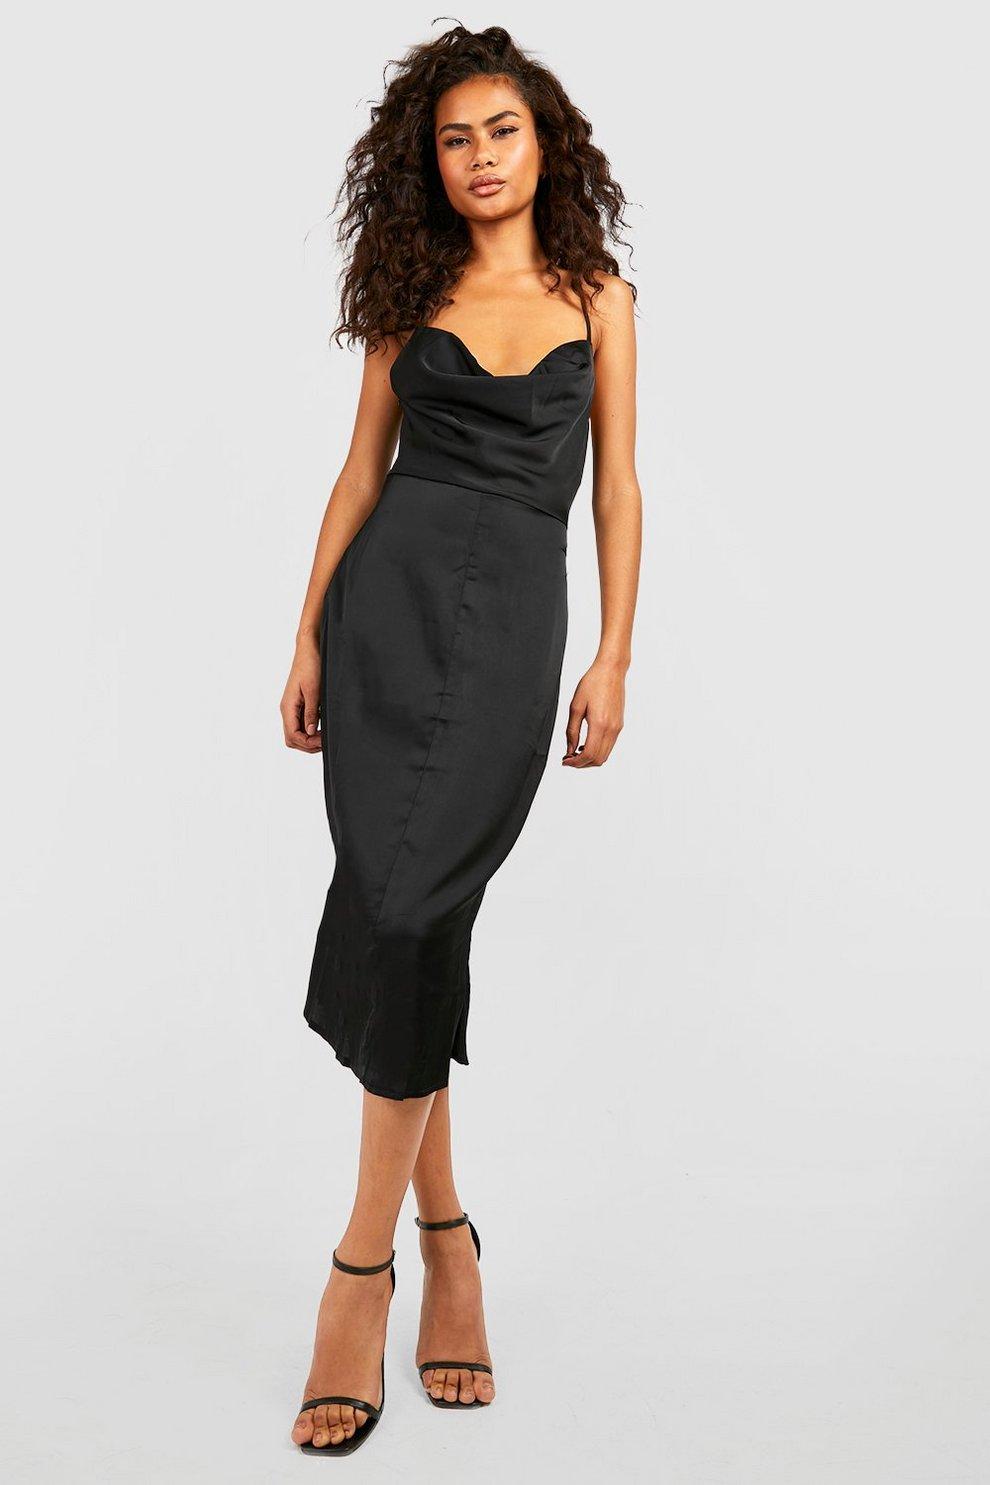 ea23a79ef885 Womens Black Satin Cowl Neck Lace Up Fish Tail Midi Dress